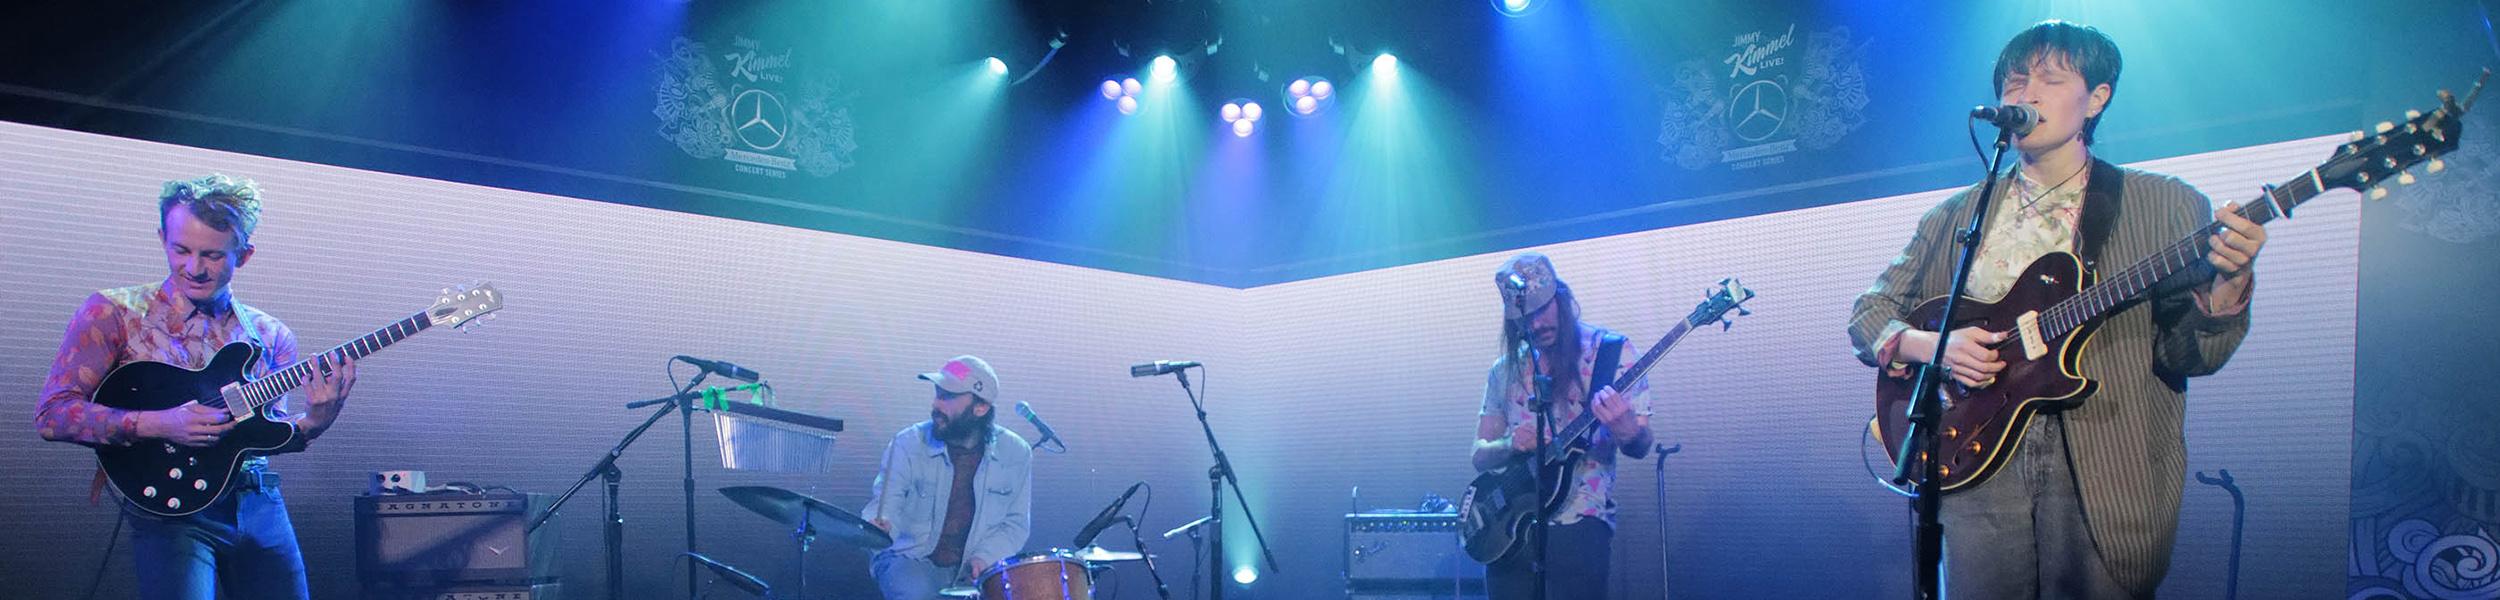 Big Thief - Big Thief Perform 'Shoulders' On Kimmel, New Tour Dates